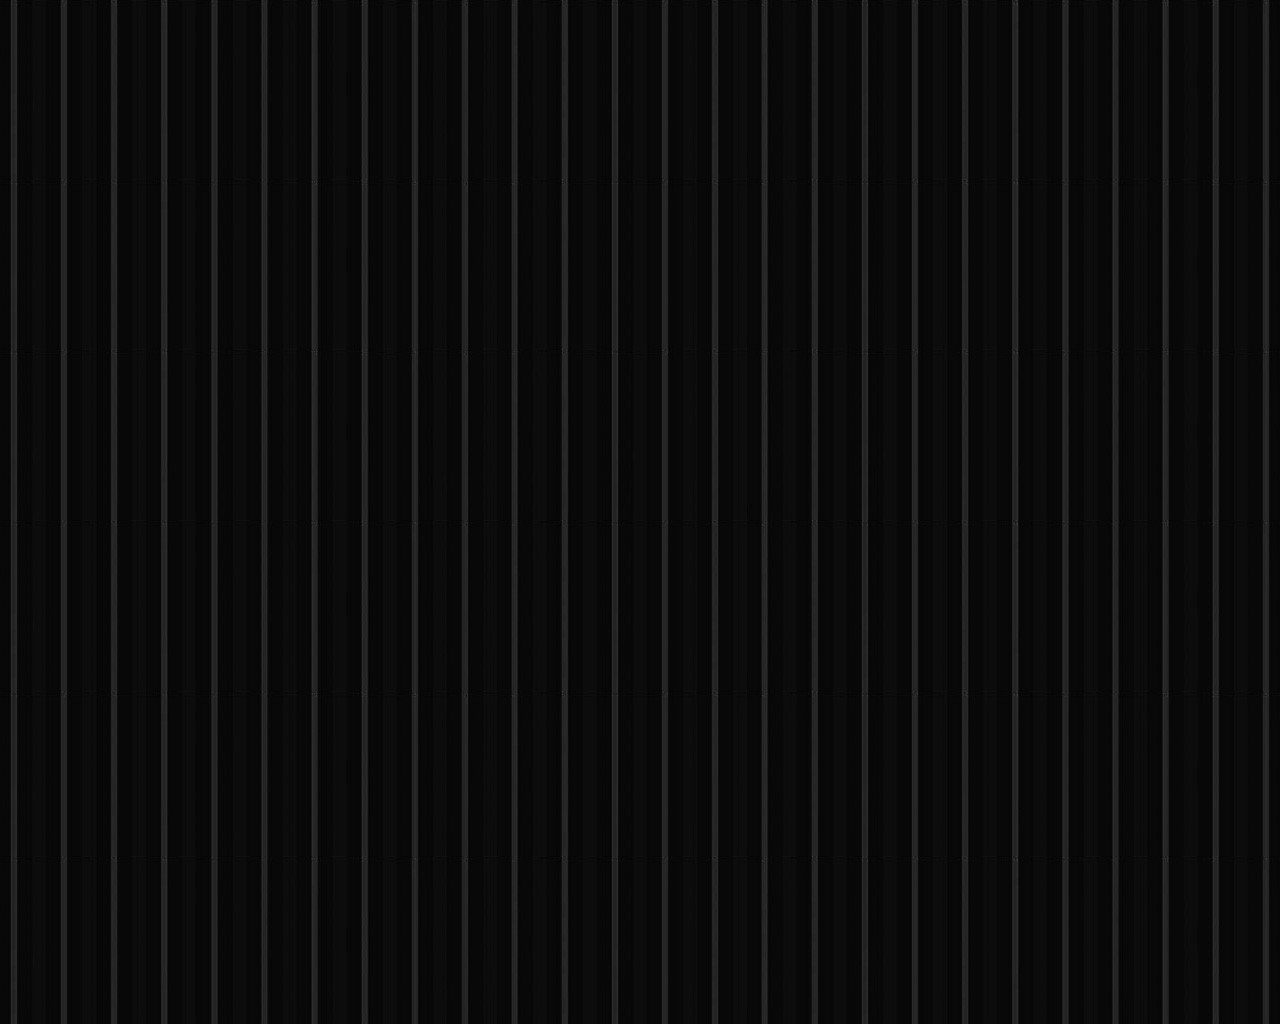 Wallpaper Hd Black White Black Lines Graphic Preview Createblog